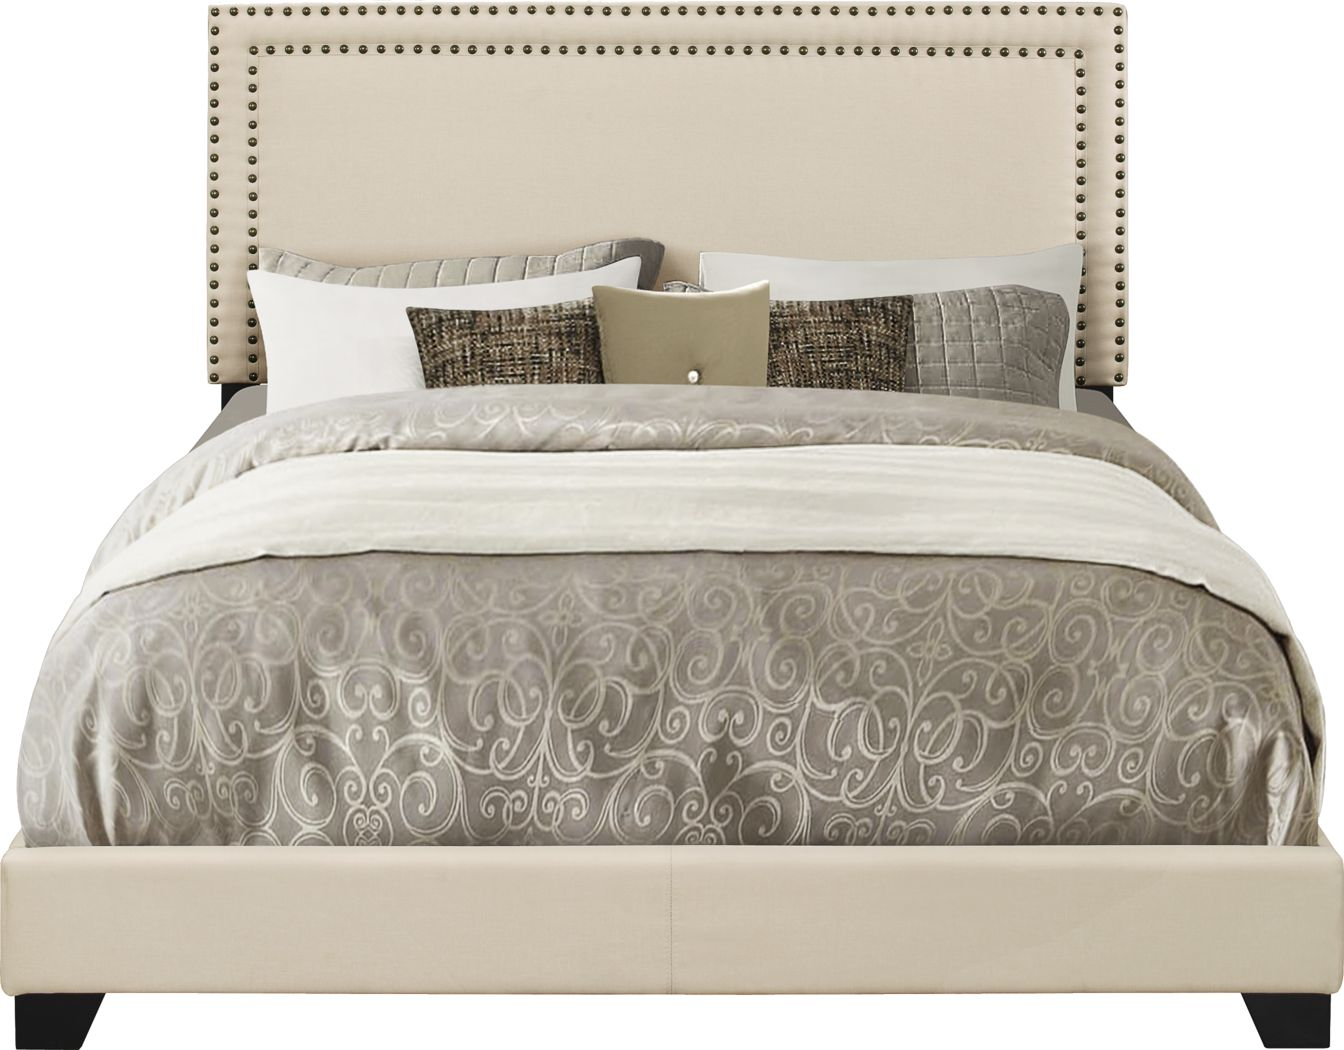 Melina Cream Queen Upholstered Bed